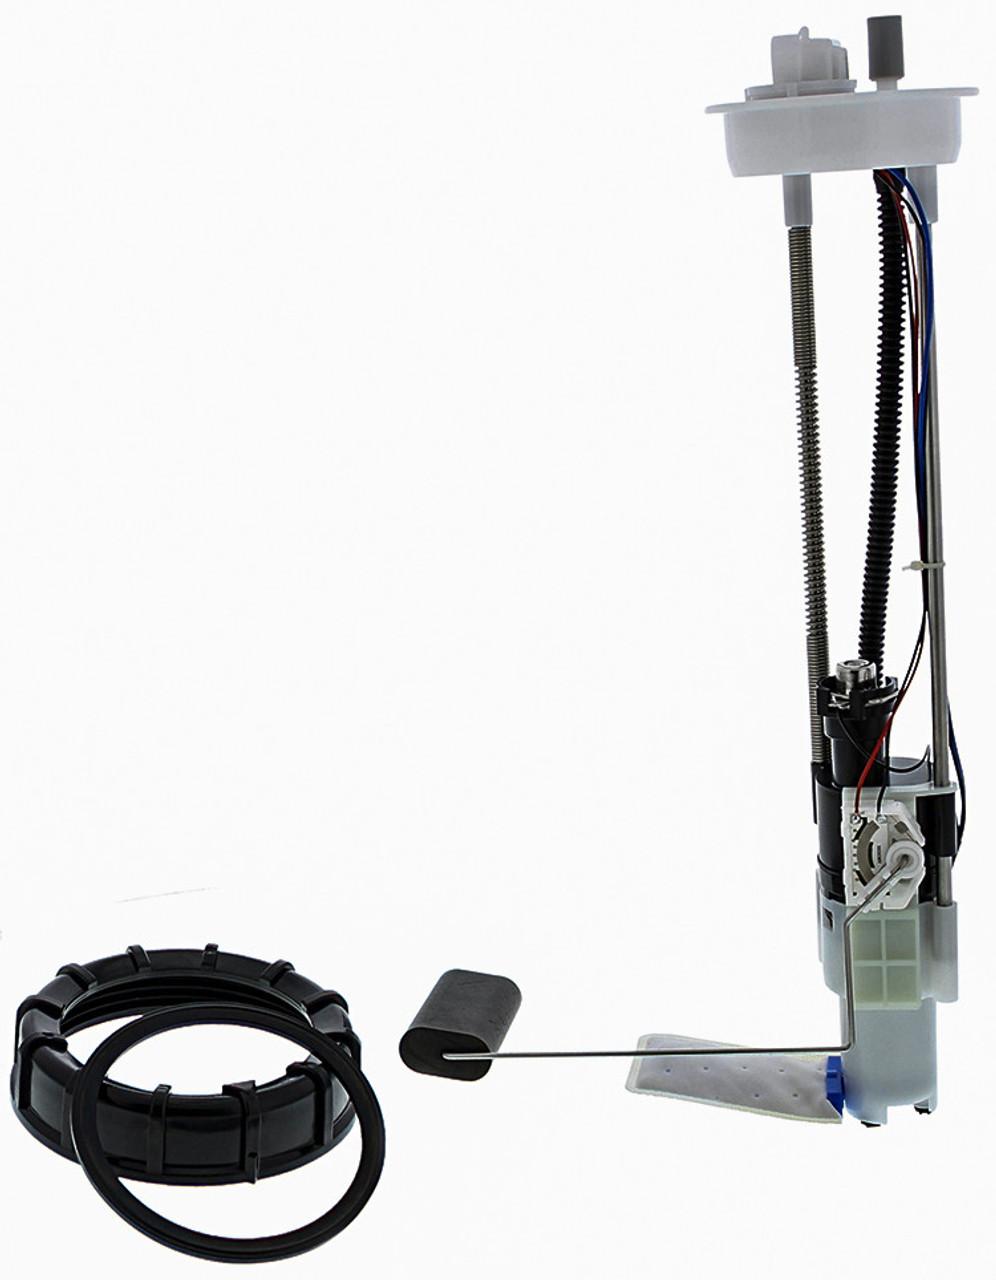 Fuel Pump Rebuild Kit Polaris RZR 4 800 2011-2014